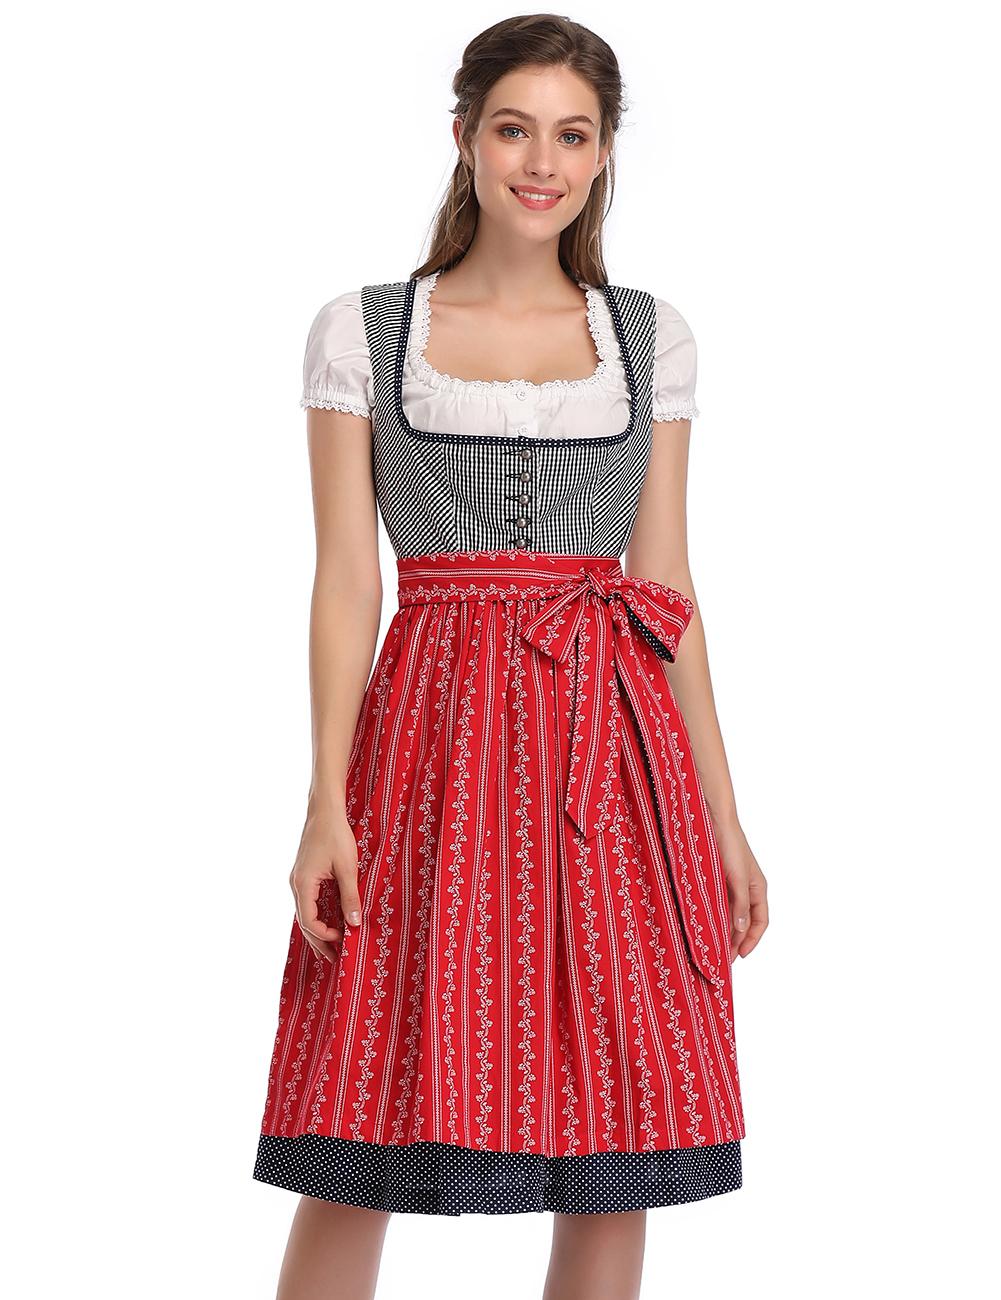 KOJOOIN Women's Vintage Embroidery German Dirndl Dress Costumes for Bavarian Oktoberfest Halloween Carnival